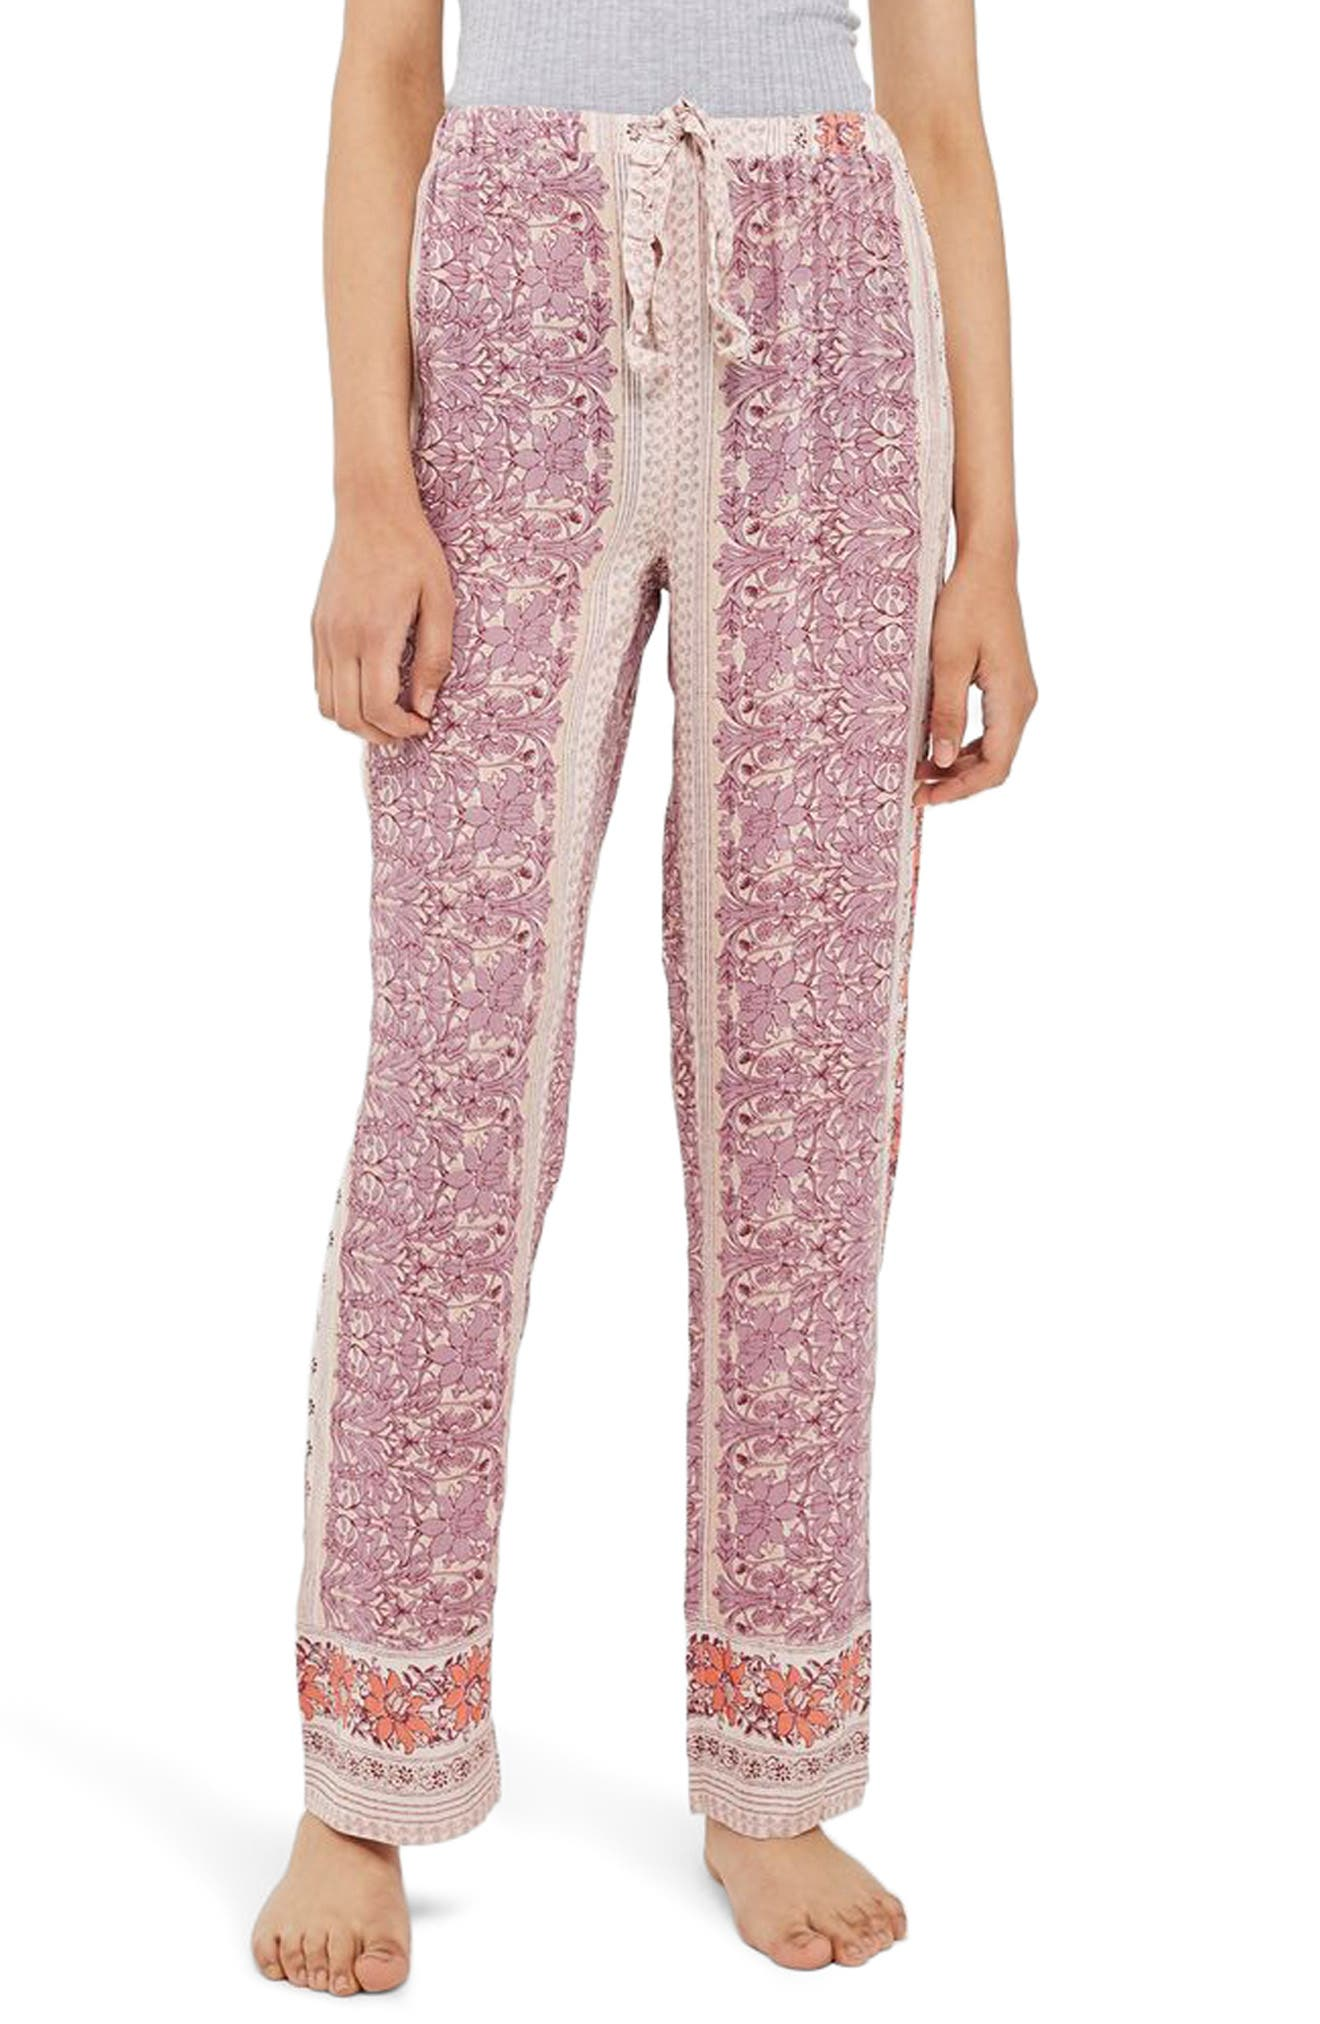 Topshop Bohemian Floral Print Pajama Pants